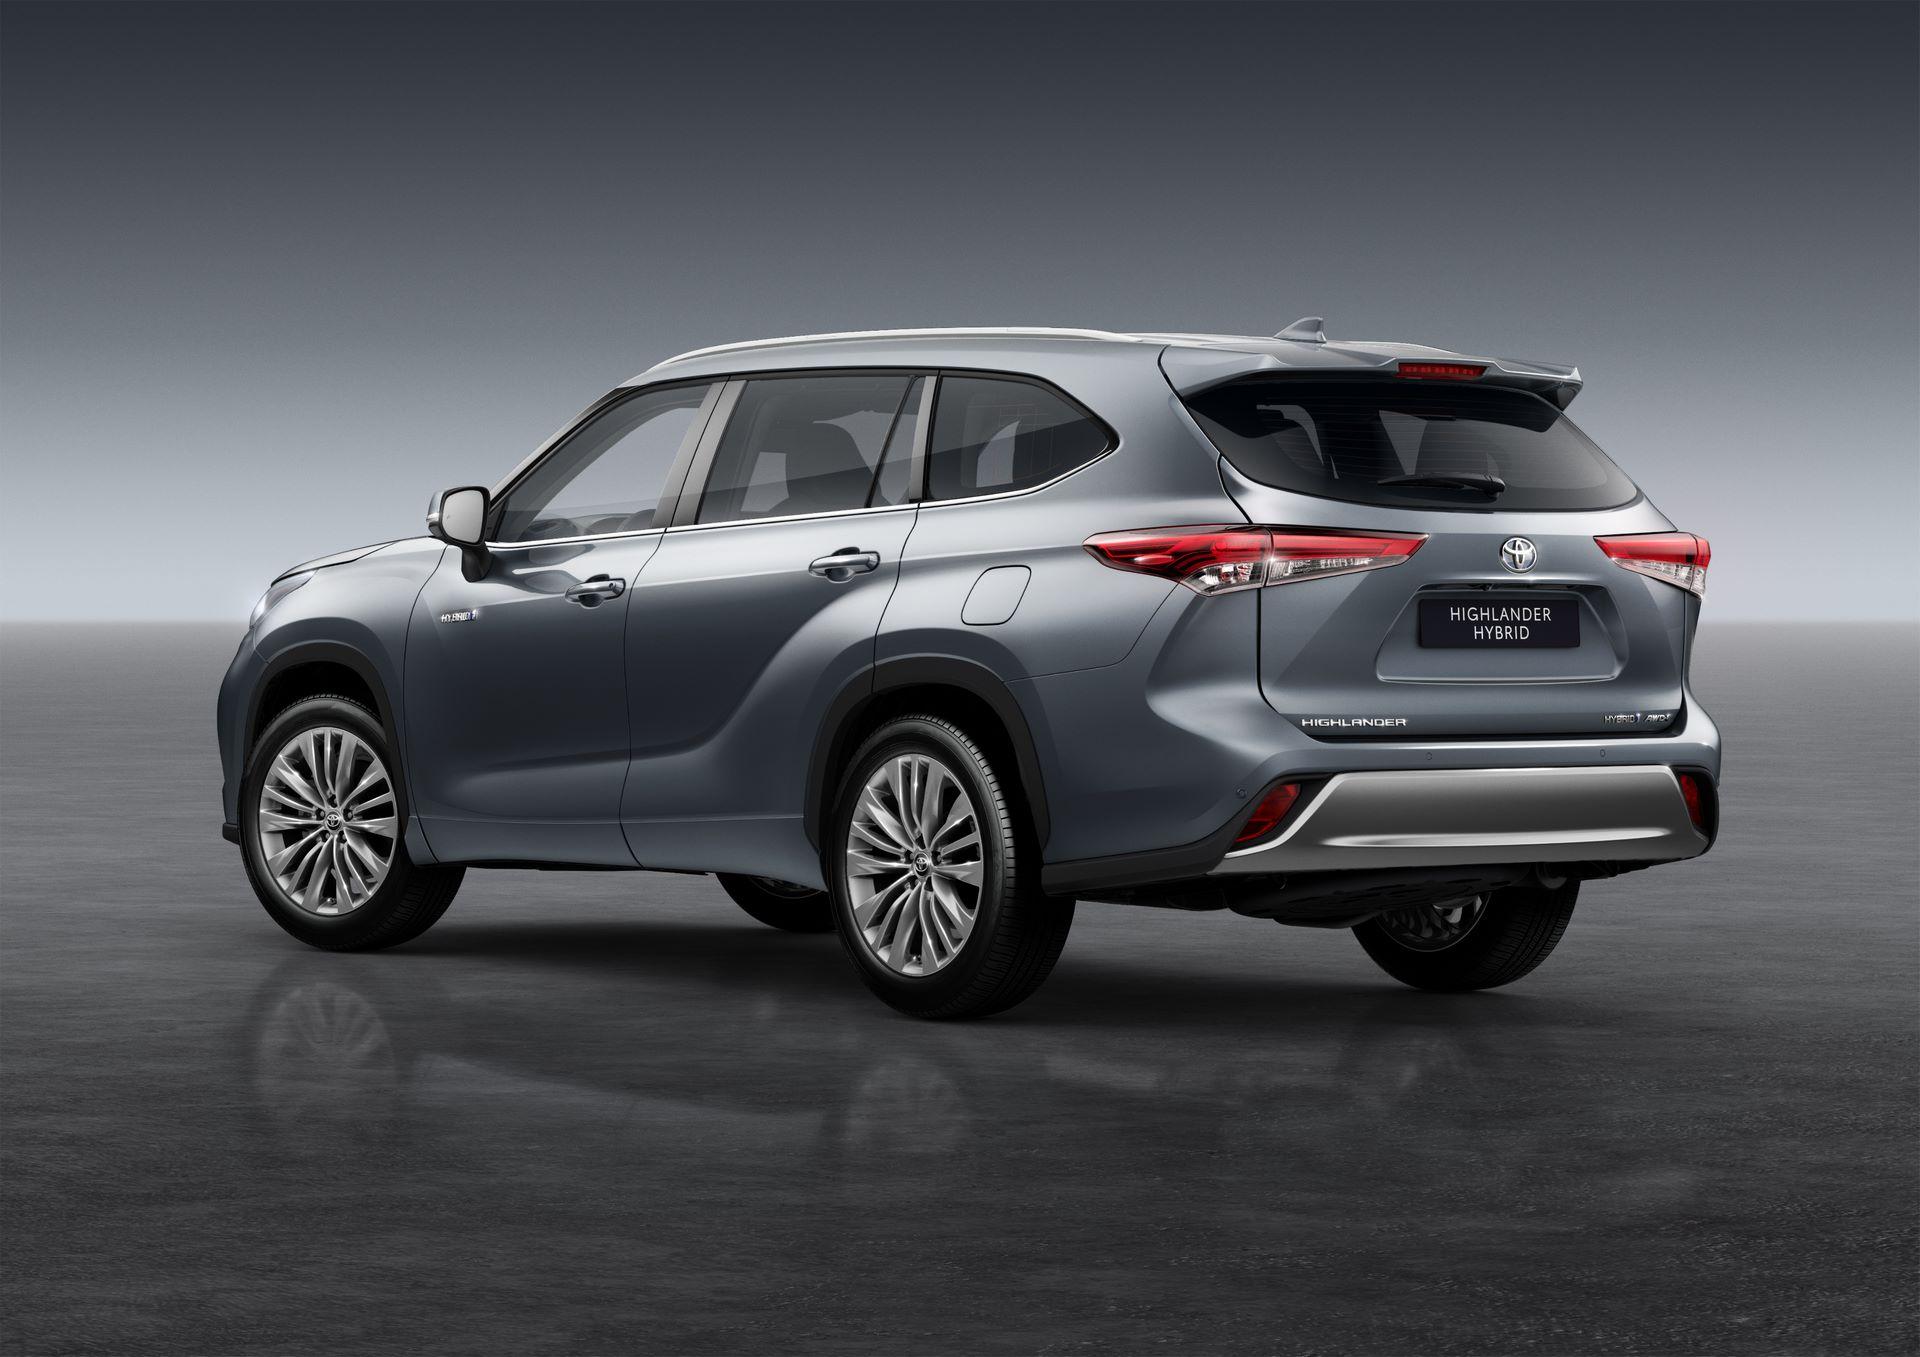 Toyota-Highlander-Europe-2021-2